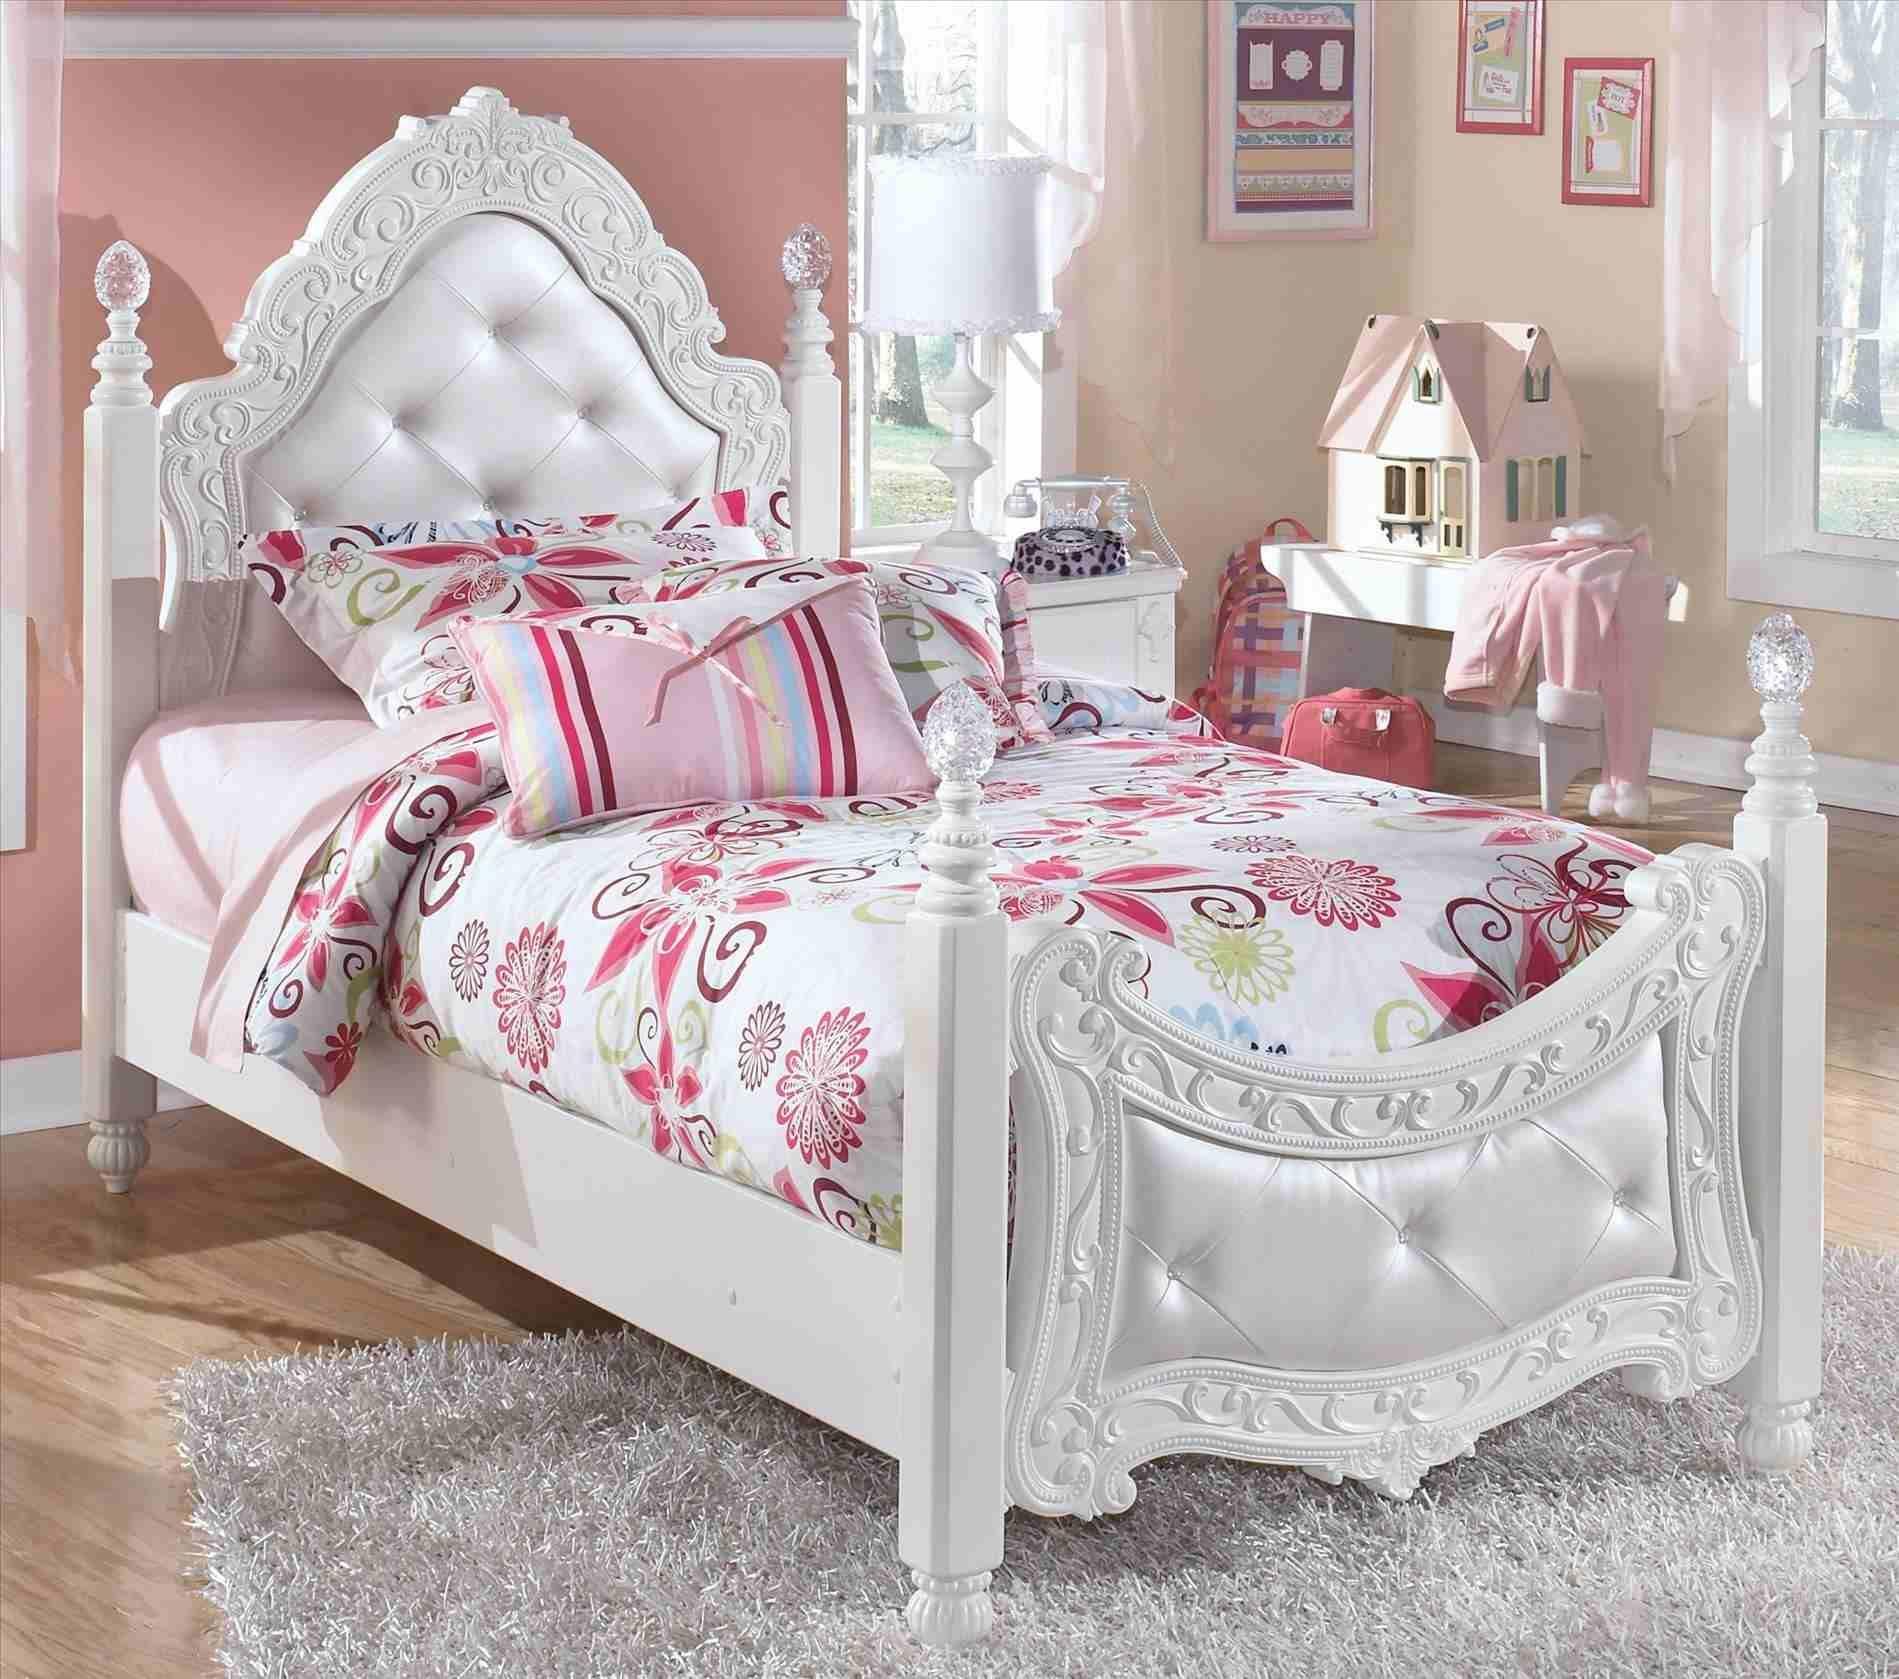 Girls Princess Bedrooms full images of twin bedroom furniture sets